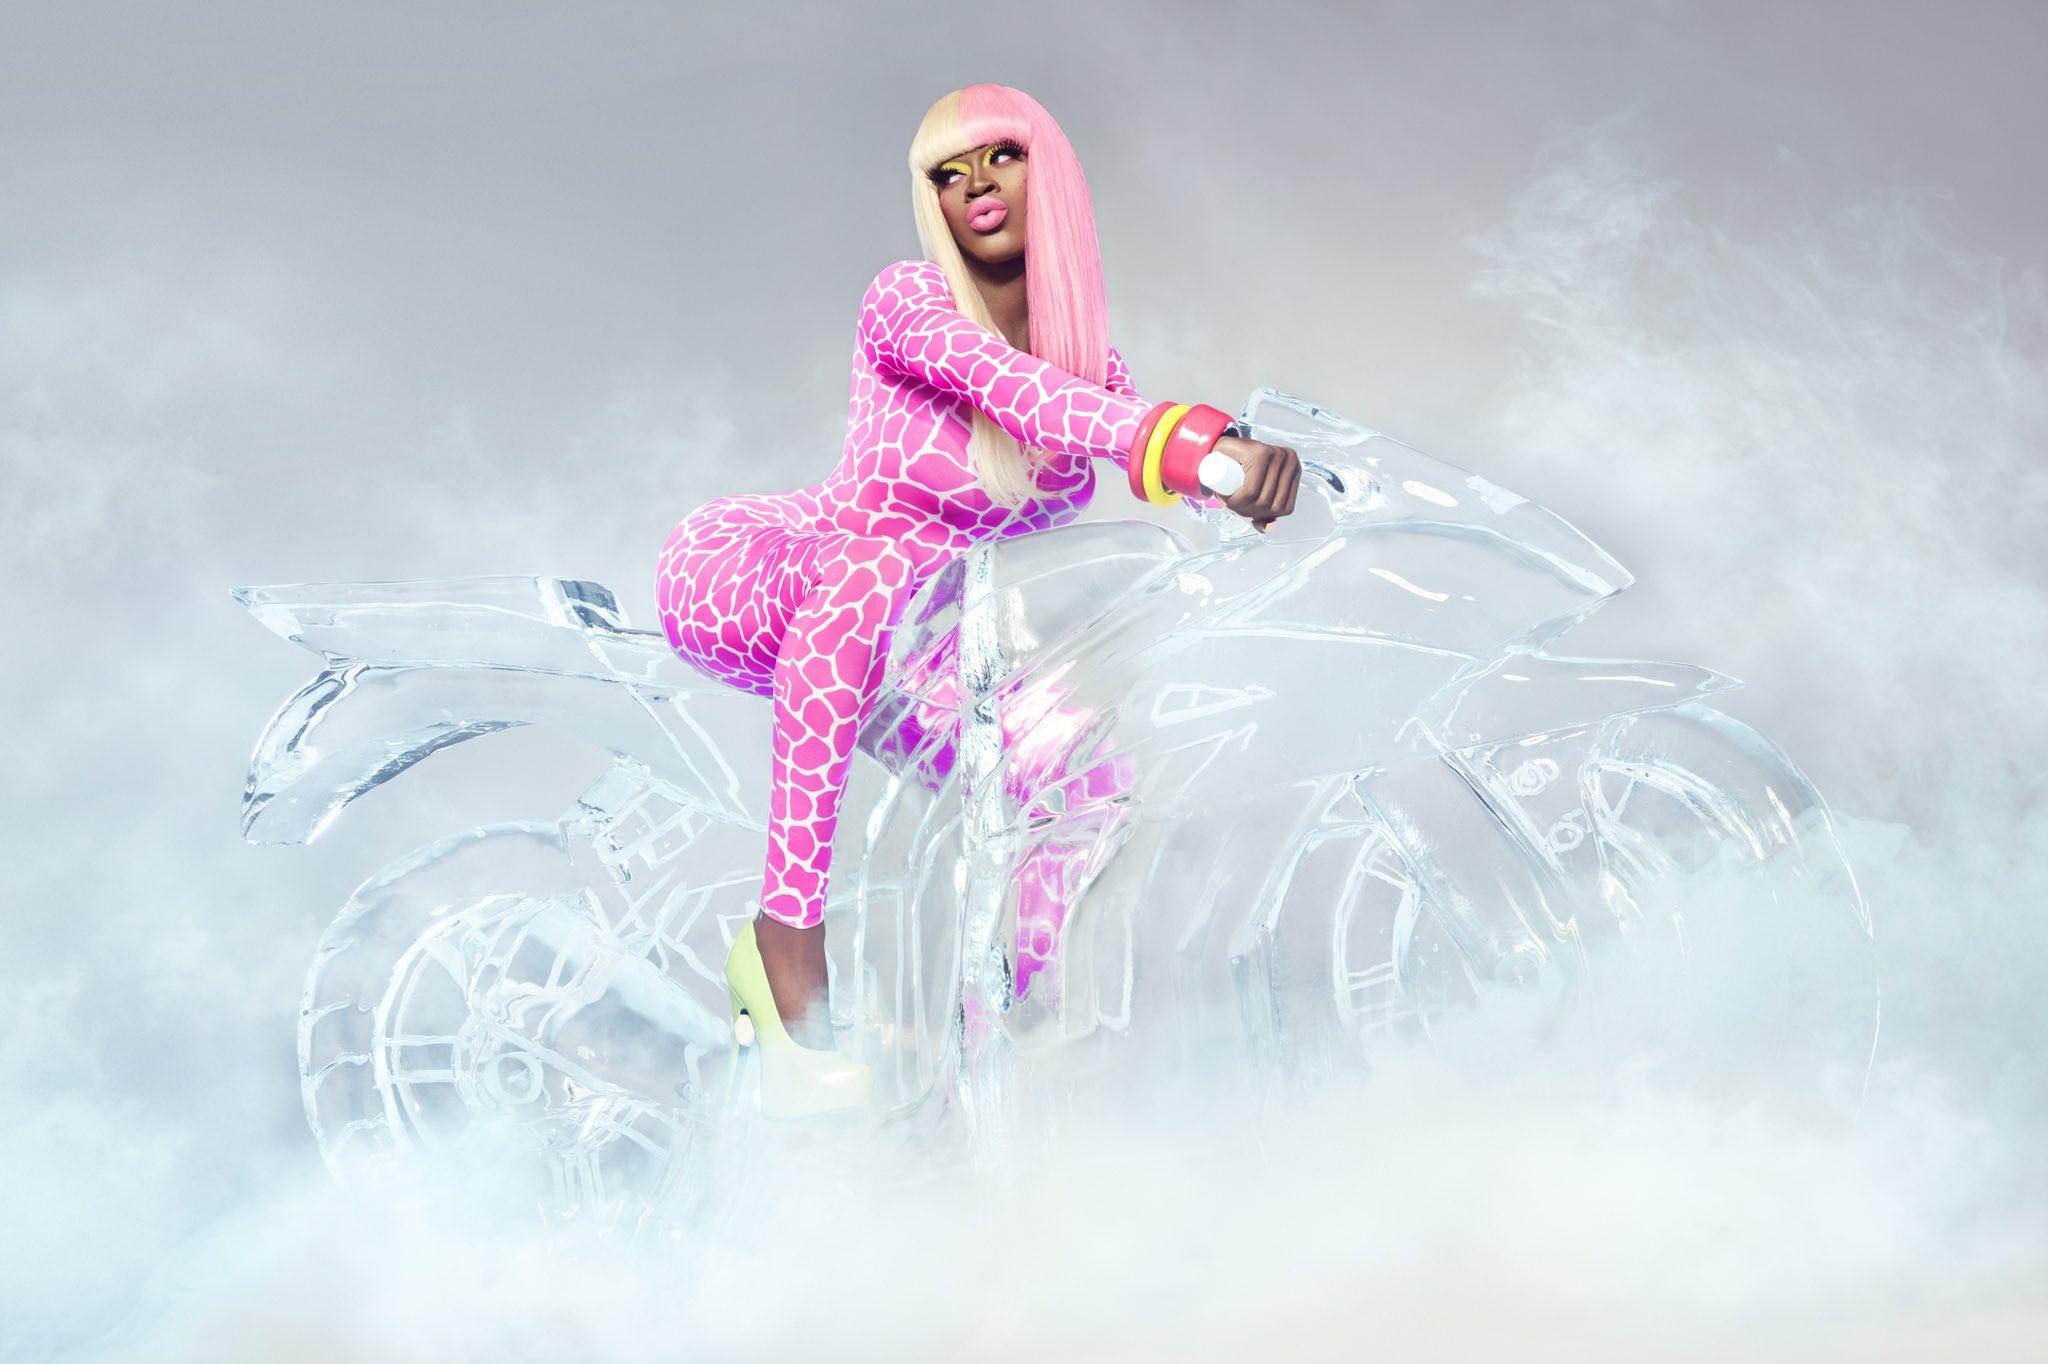 Lil Nas X transforms into Nicki Minaj for Halloween